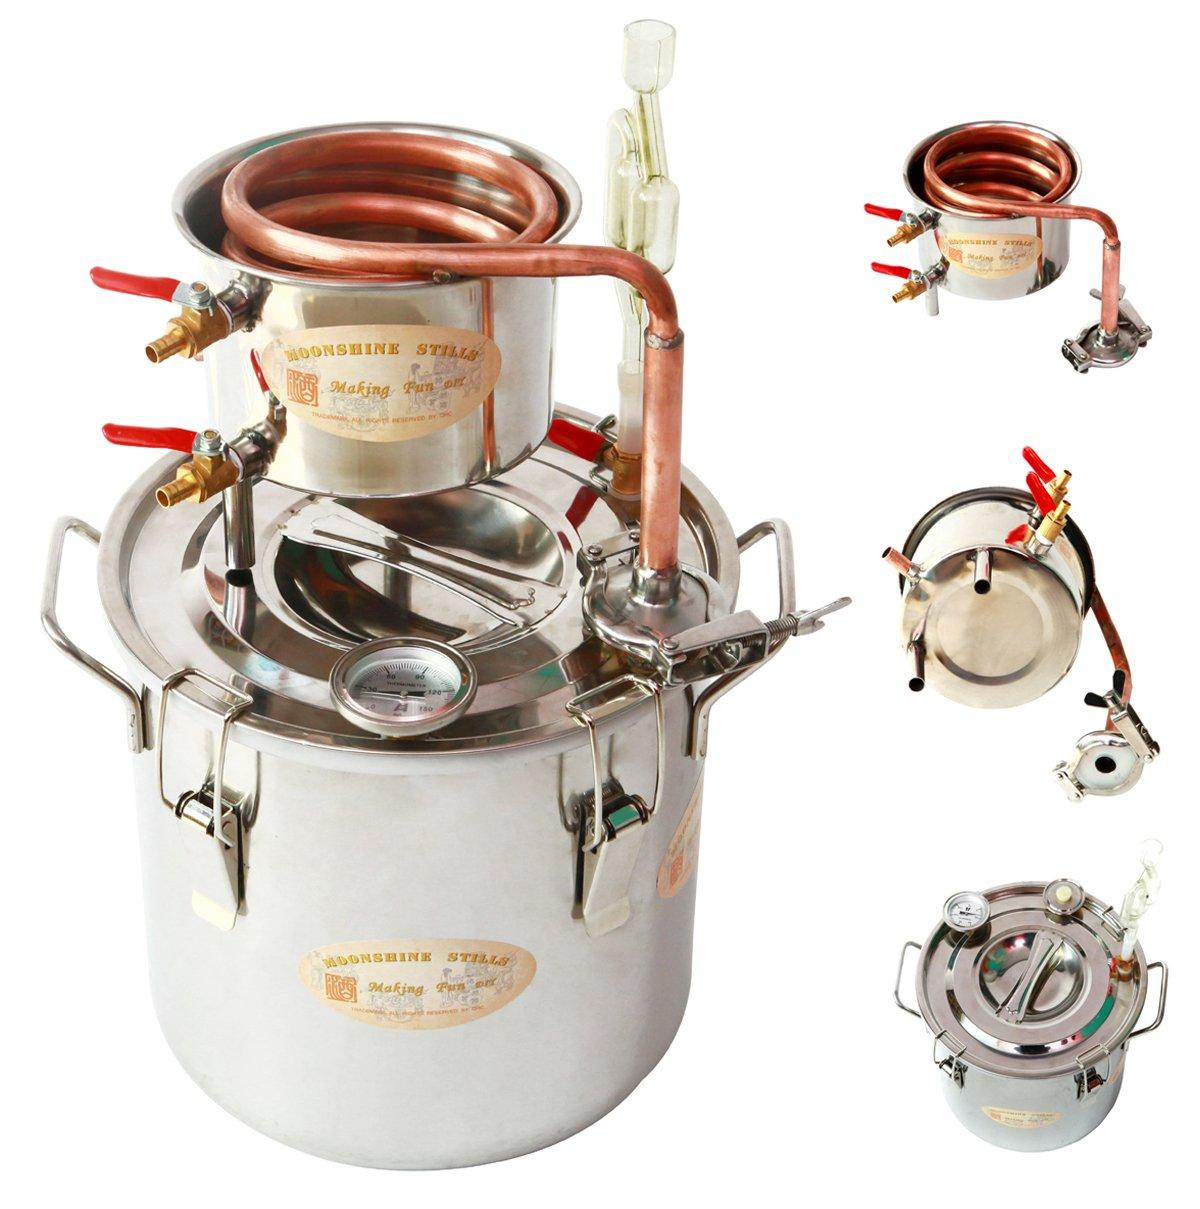 Diy 3 Gal 12 Liters Home Distiller Moonshine Alcohol Still Stainless Boiler C.. 18